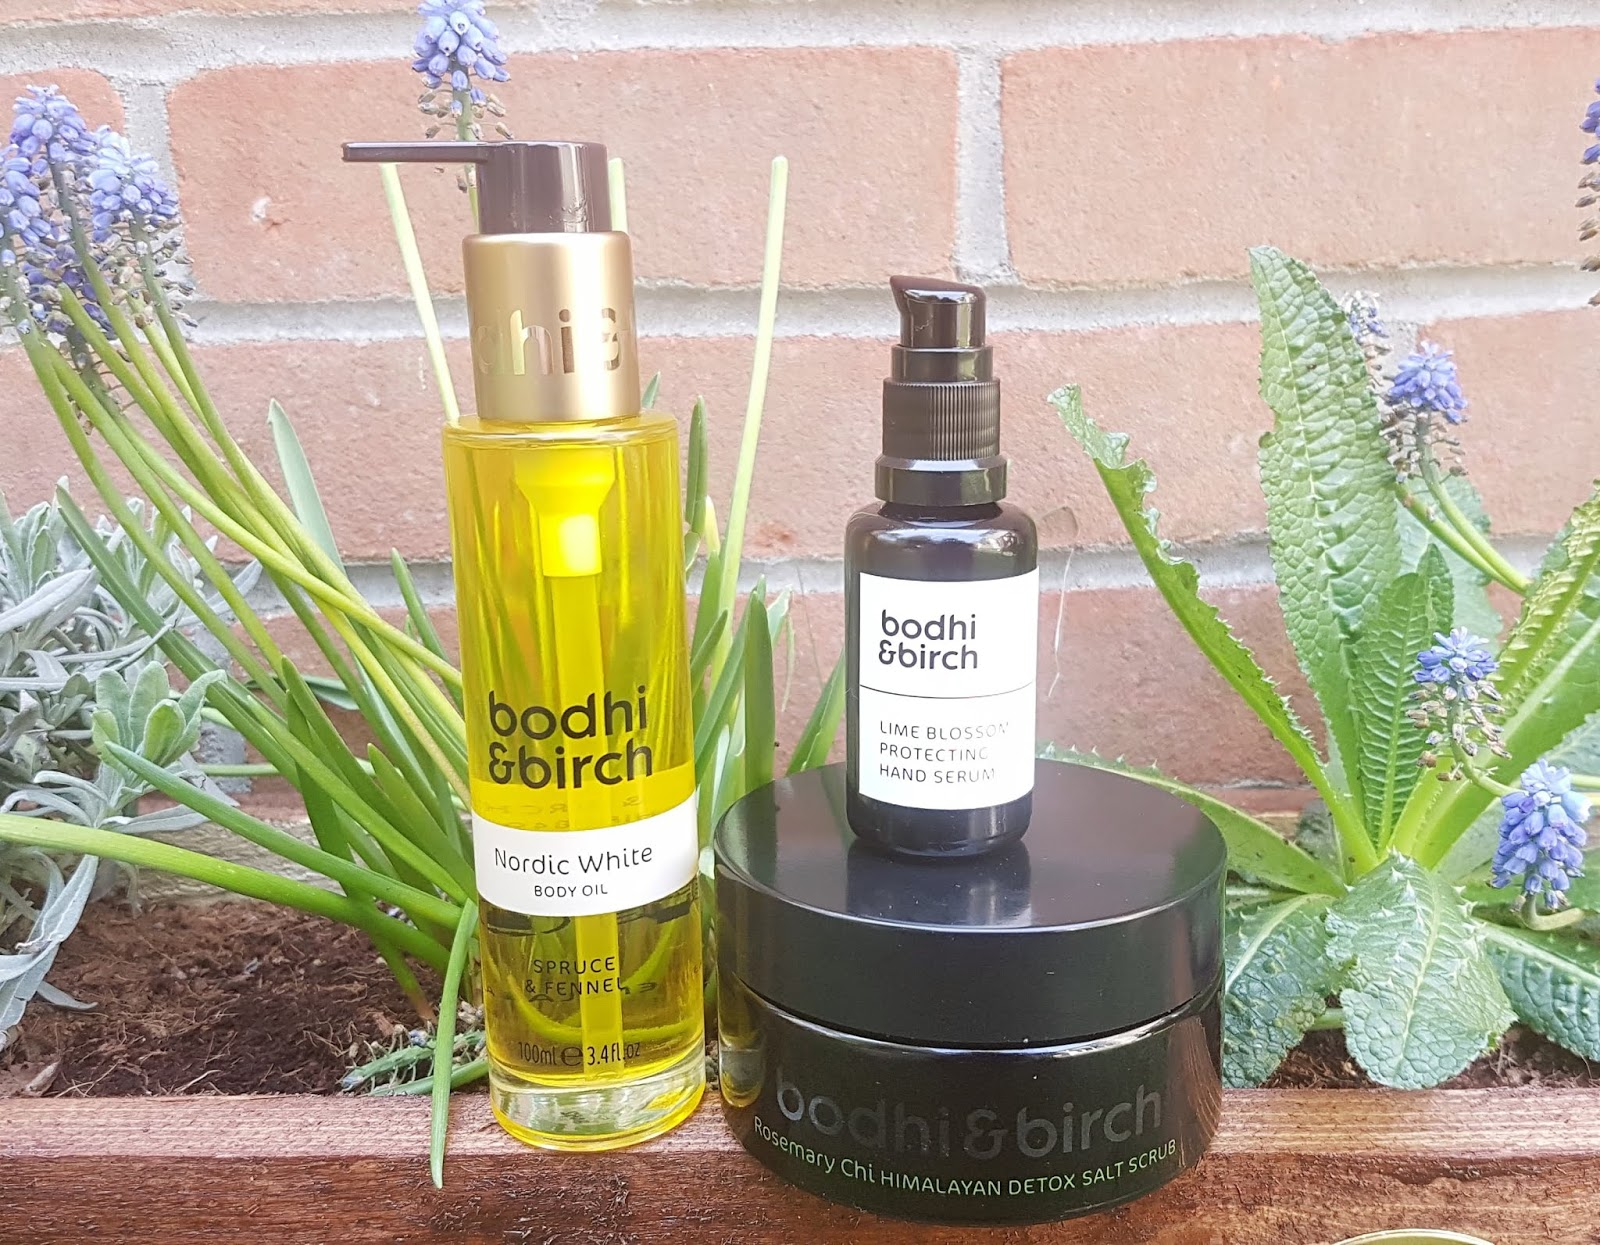 Bodhi & Birch Review - Eco Luxe Skincare Brand